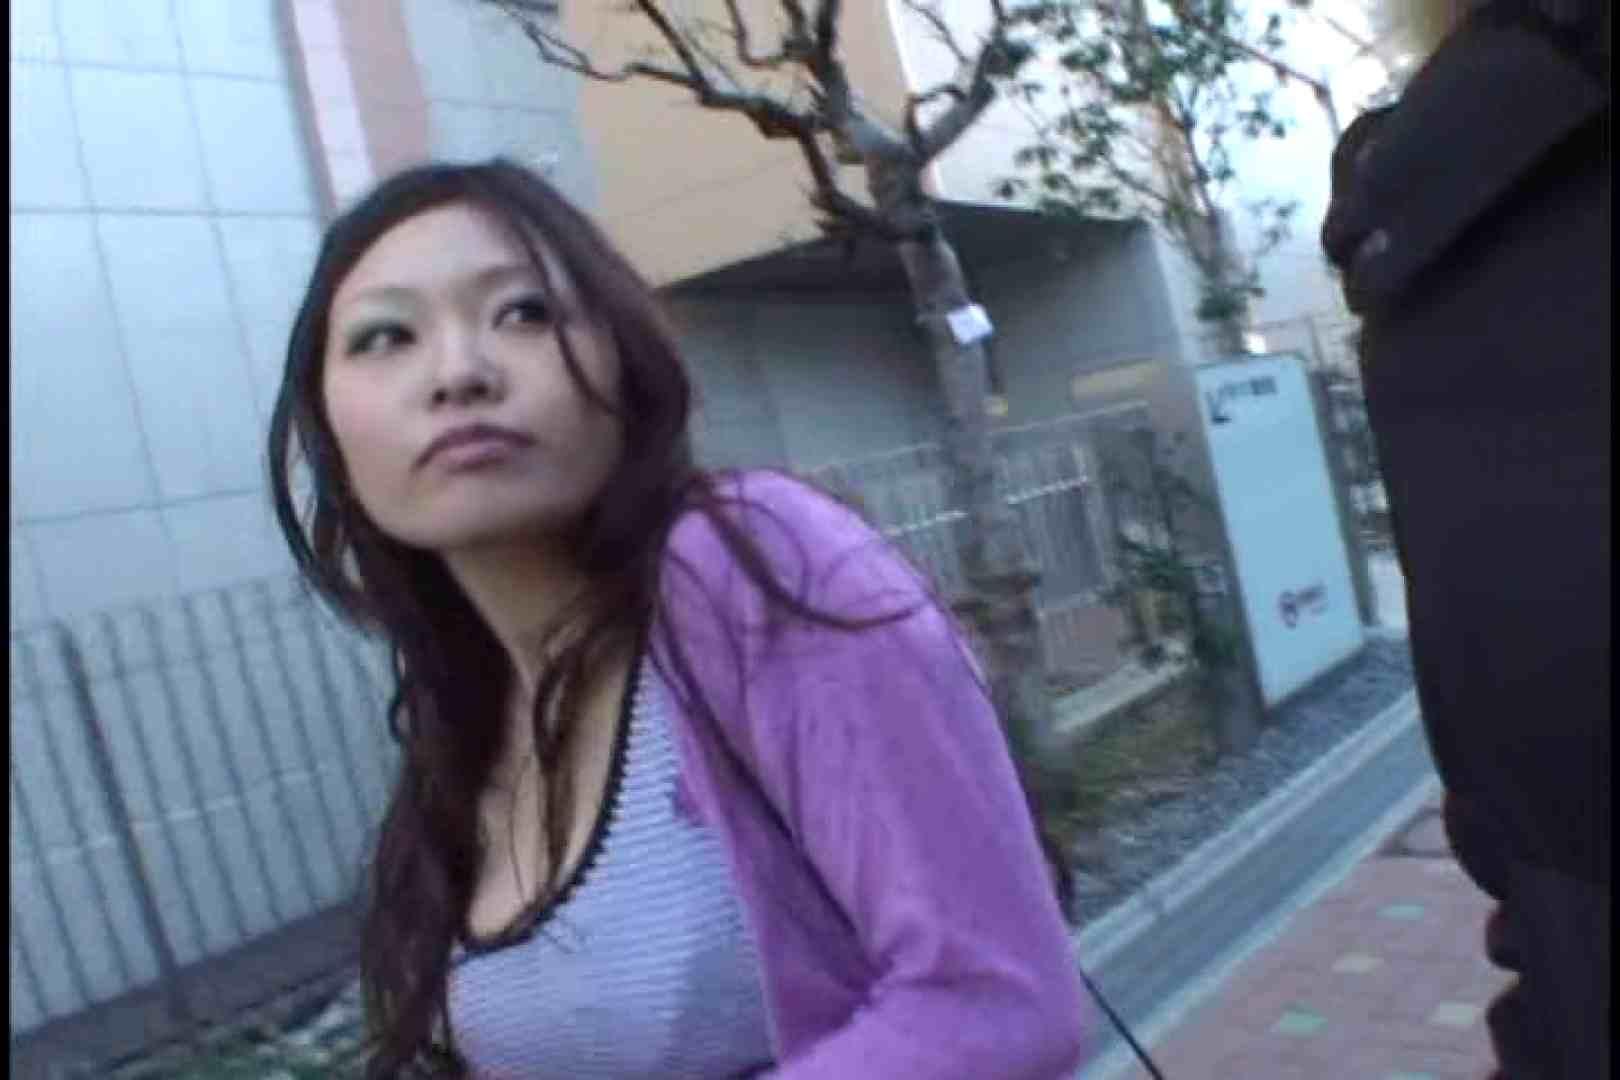 JDハンター全国ツアー vol.040 前編 女子大生のエロ動画 | 0  101PIX 27